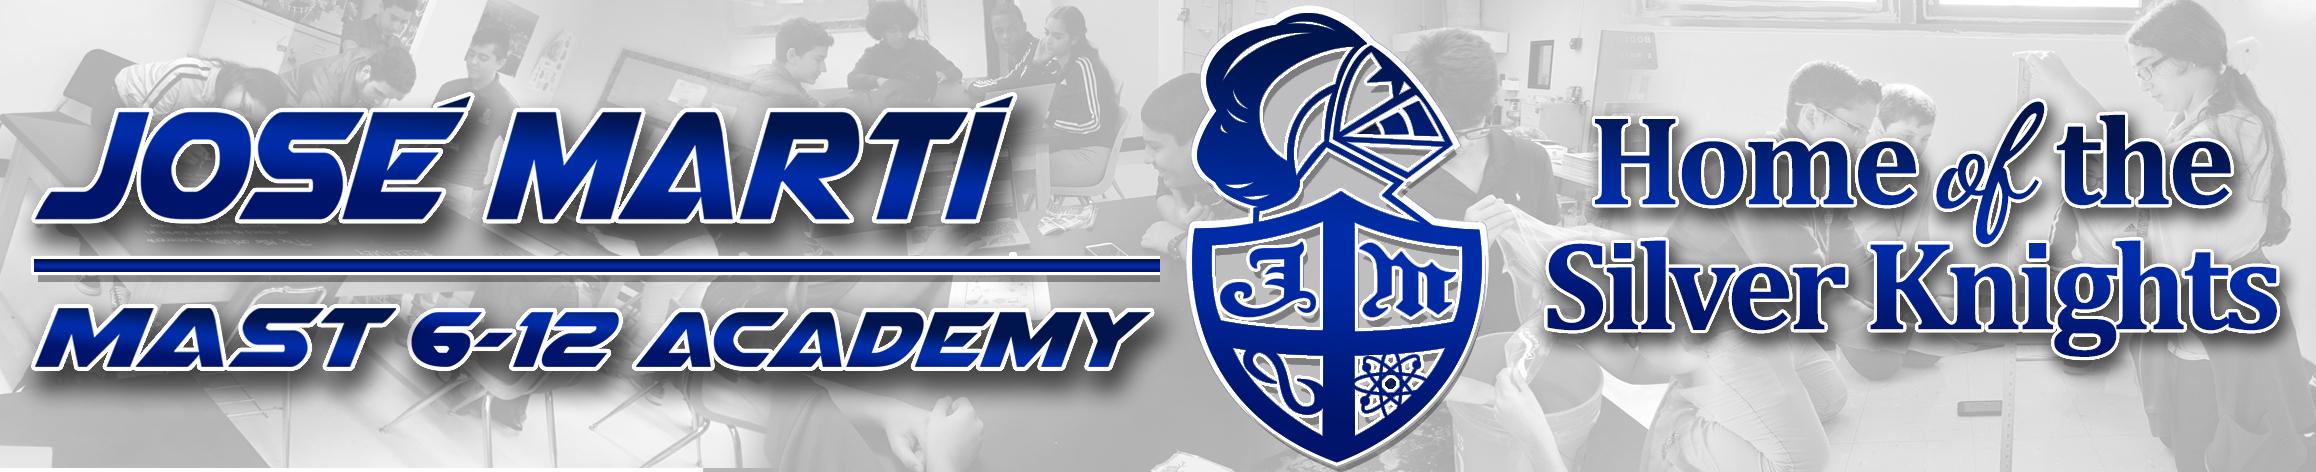 Jose Marti MAST 6-12 Academy